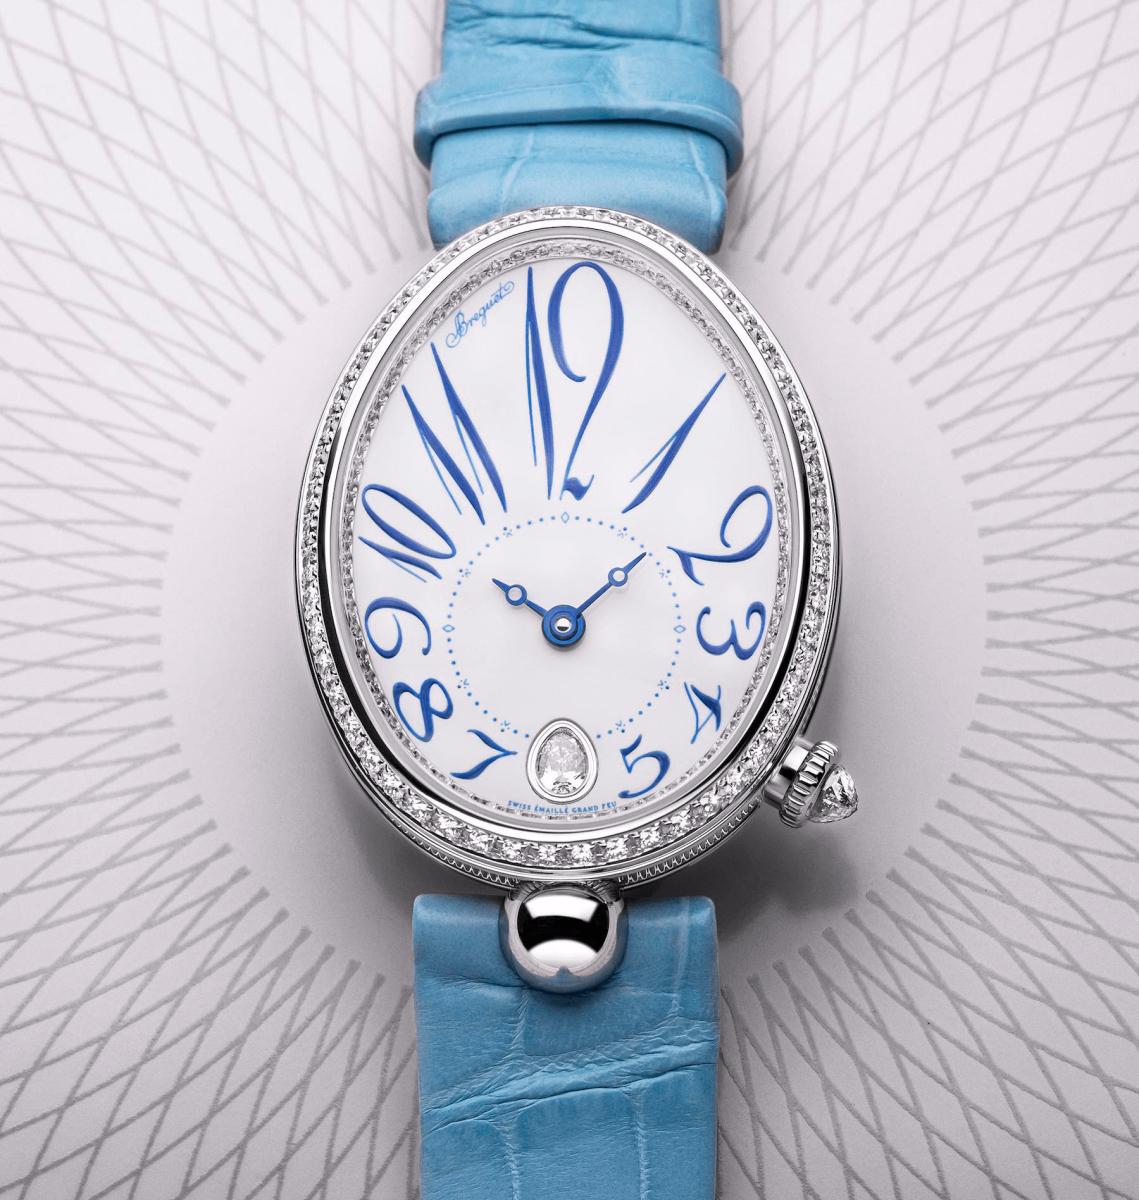 đồng hồ nữ sang trọng Breguet Reine de Naples 88919 ra mắt năm 2020